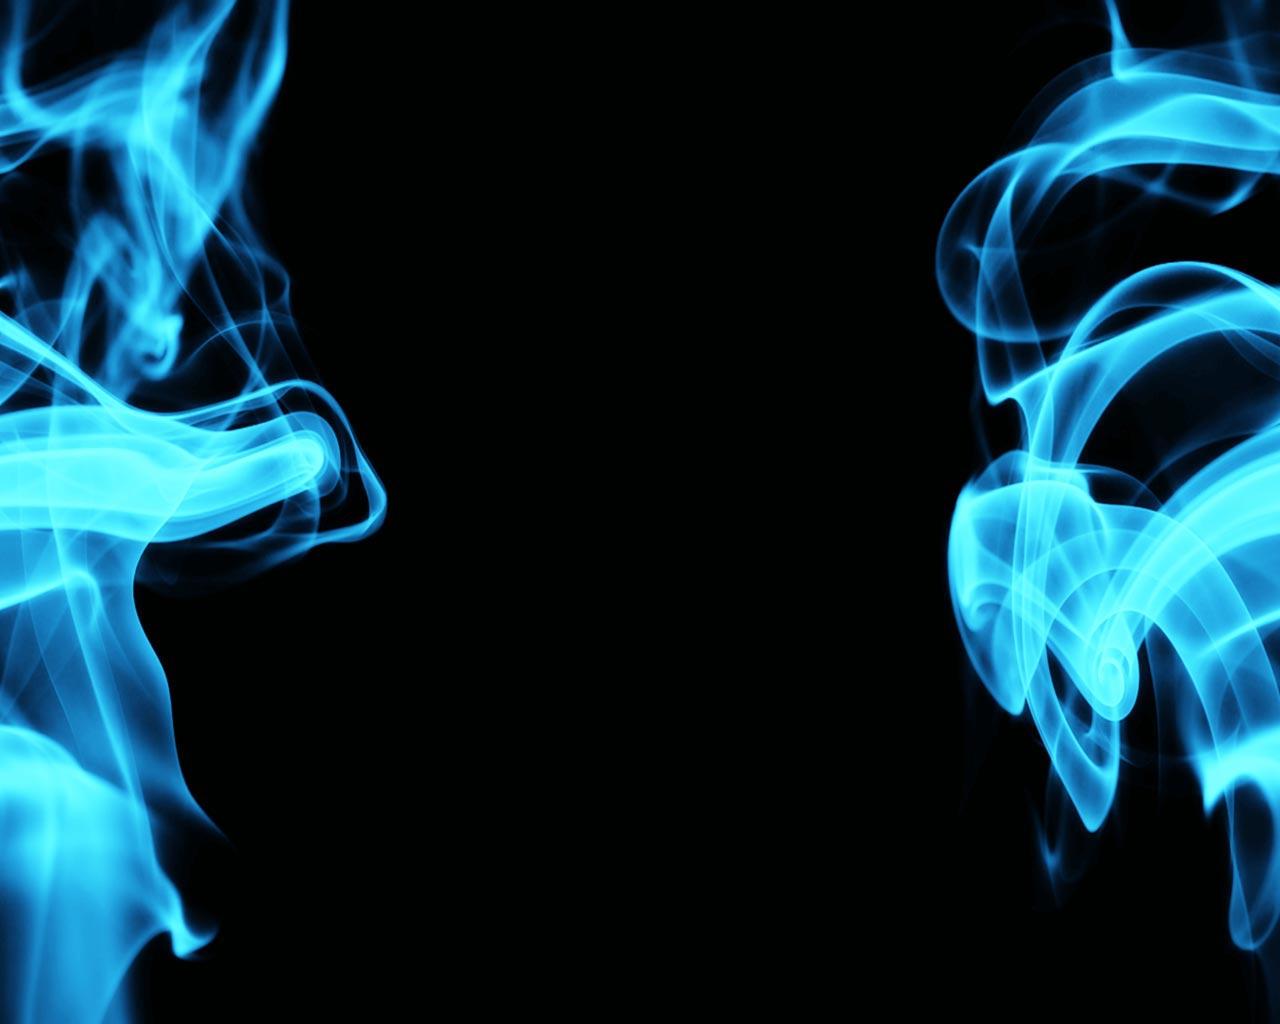 http://1.bp.blogspot.com/-SO1f-NV0hsQ/T0OEeTL-4_I/AAAAAAAADeA/-x0gsHXph_w/s1600/blue_smoke_wallpaper.jpg